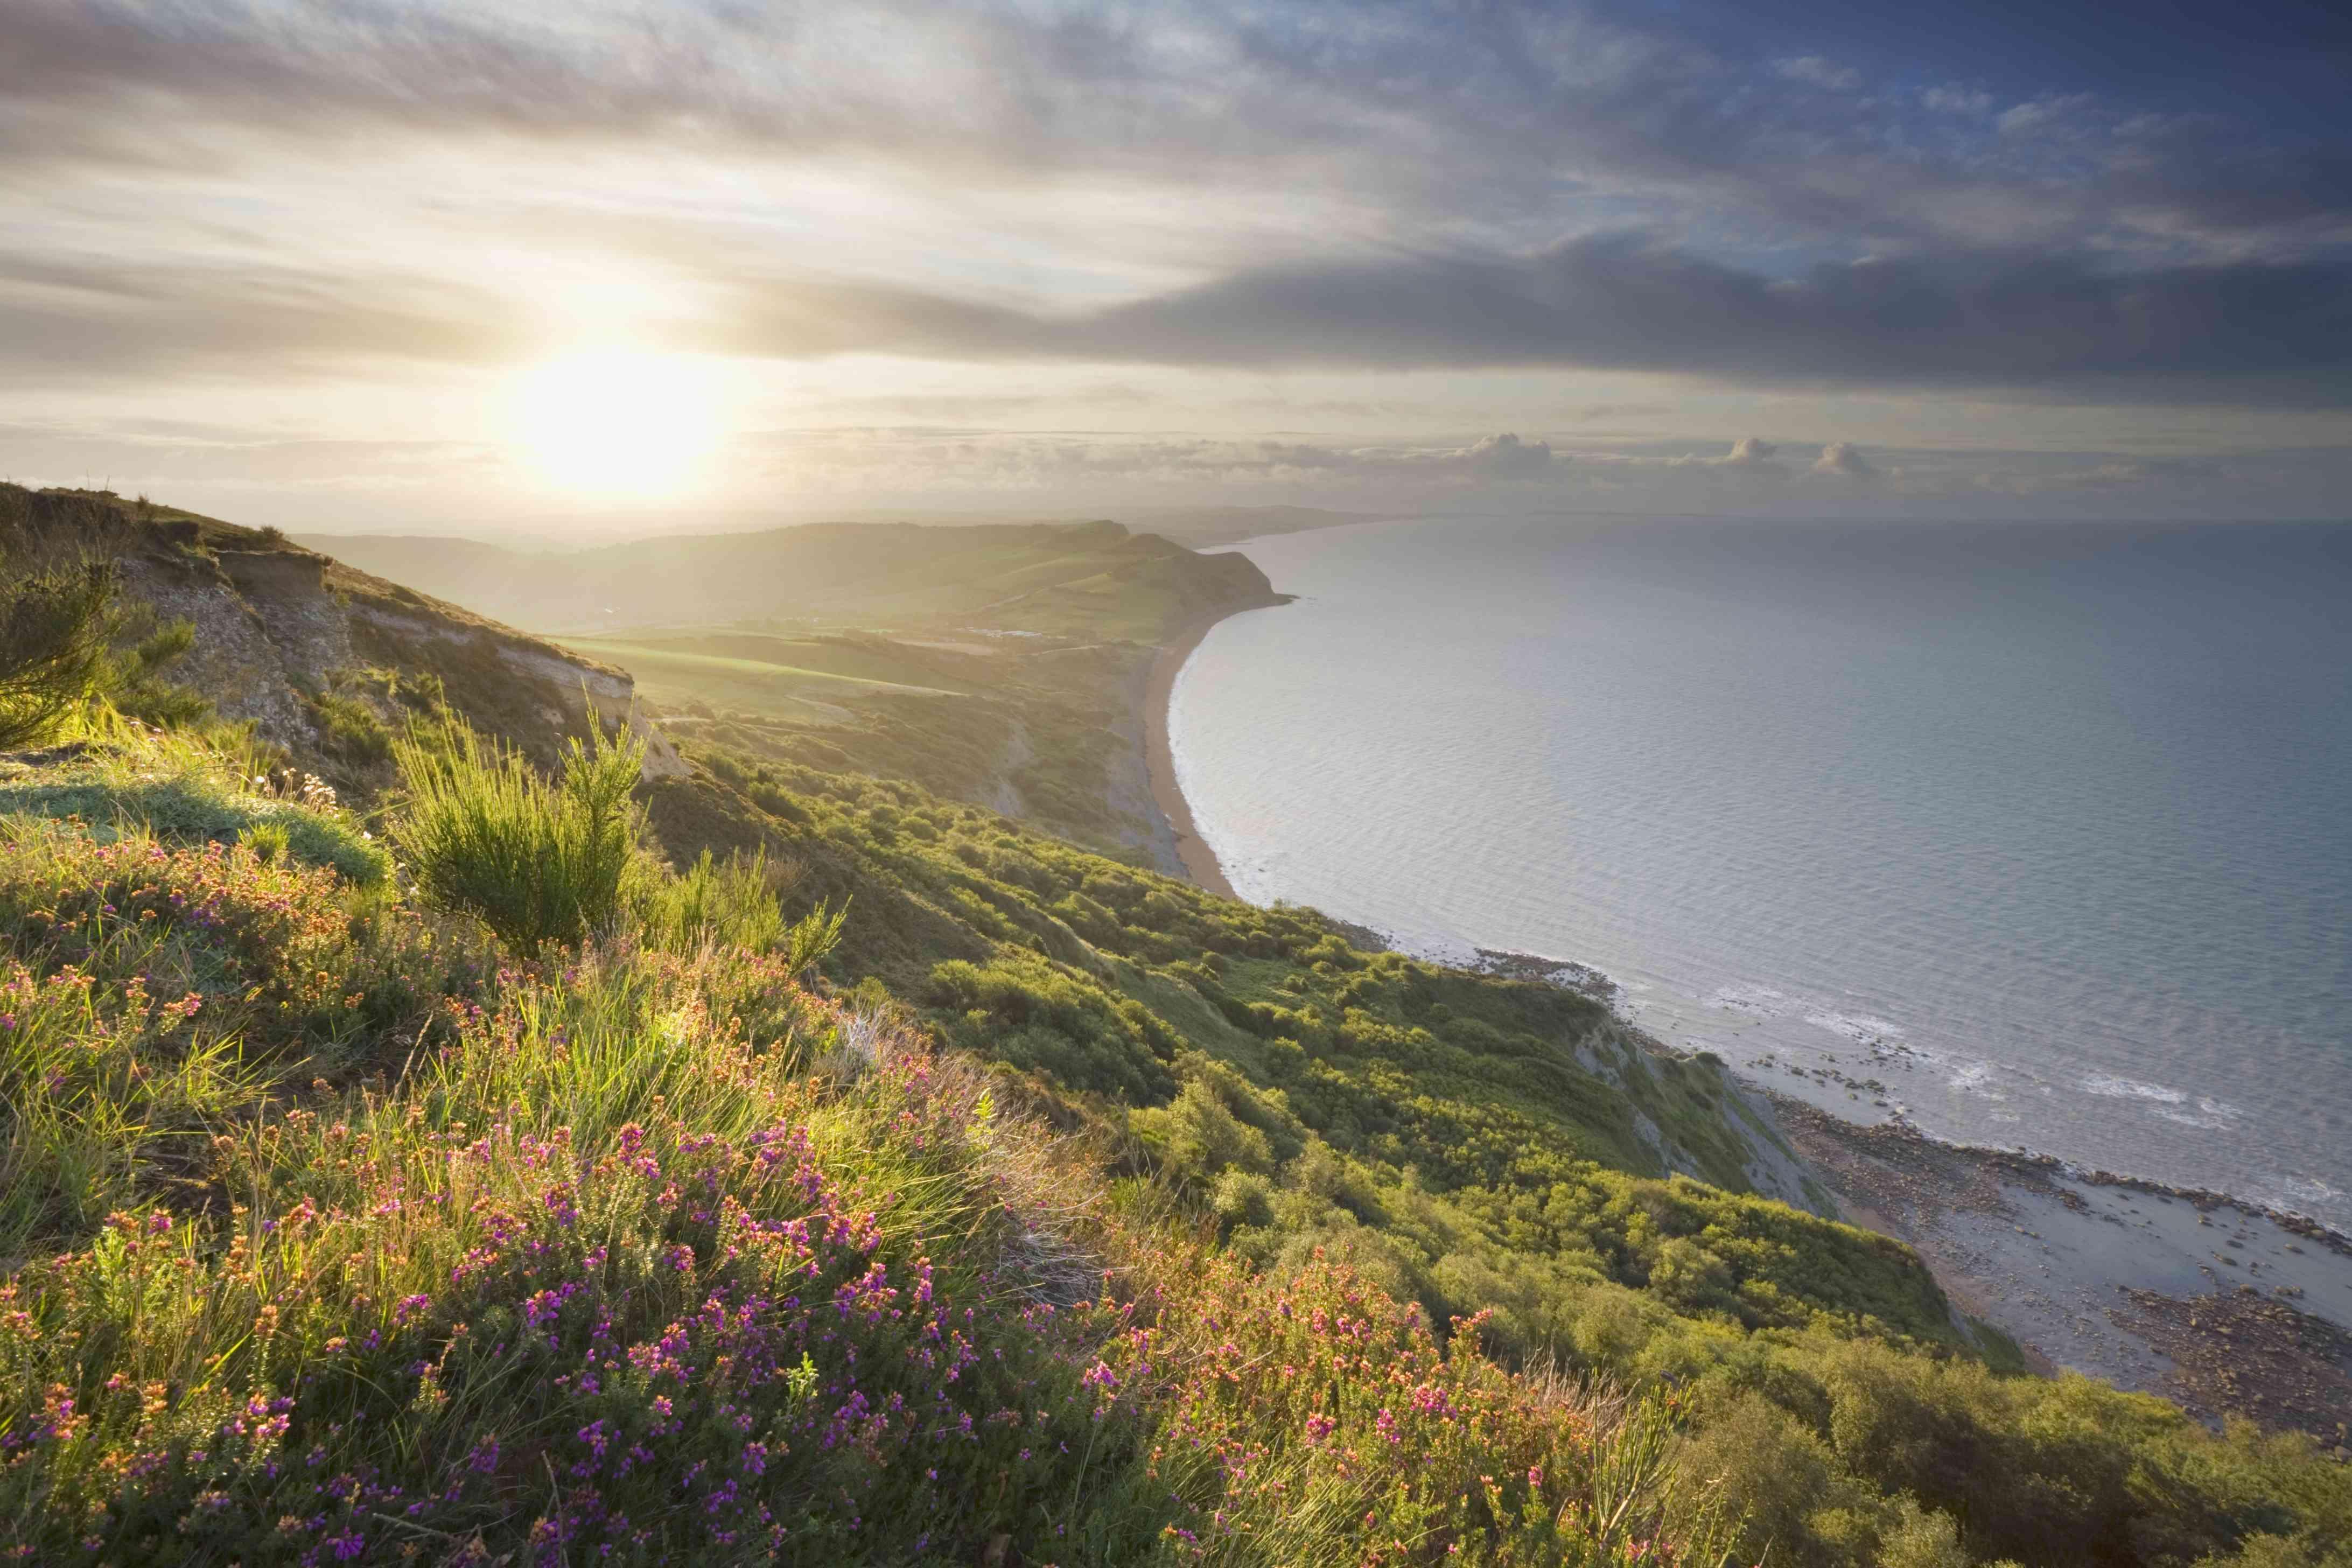 View east from Golden Cap at Sunrise, Jurassic Coast World Heritage Site, Dorset, England, UK